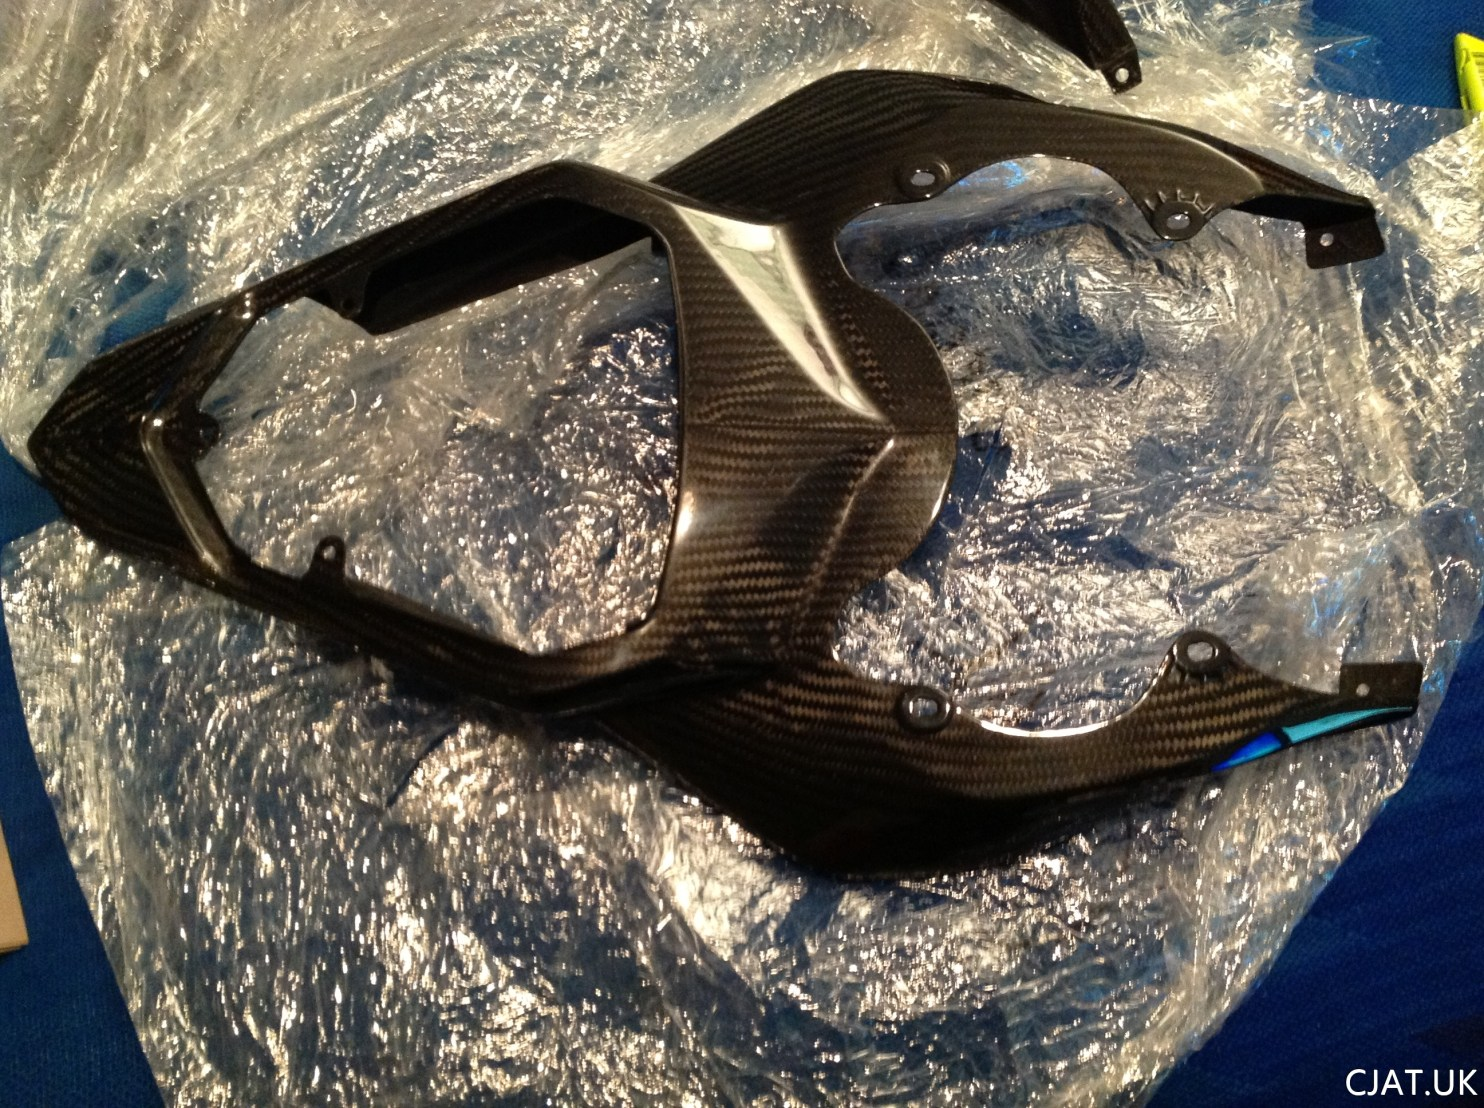 R6 2c0 06/07 carbon tail swap on RF900